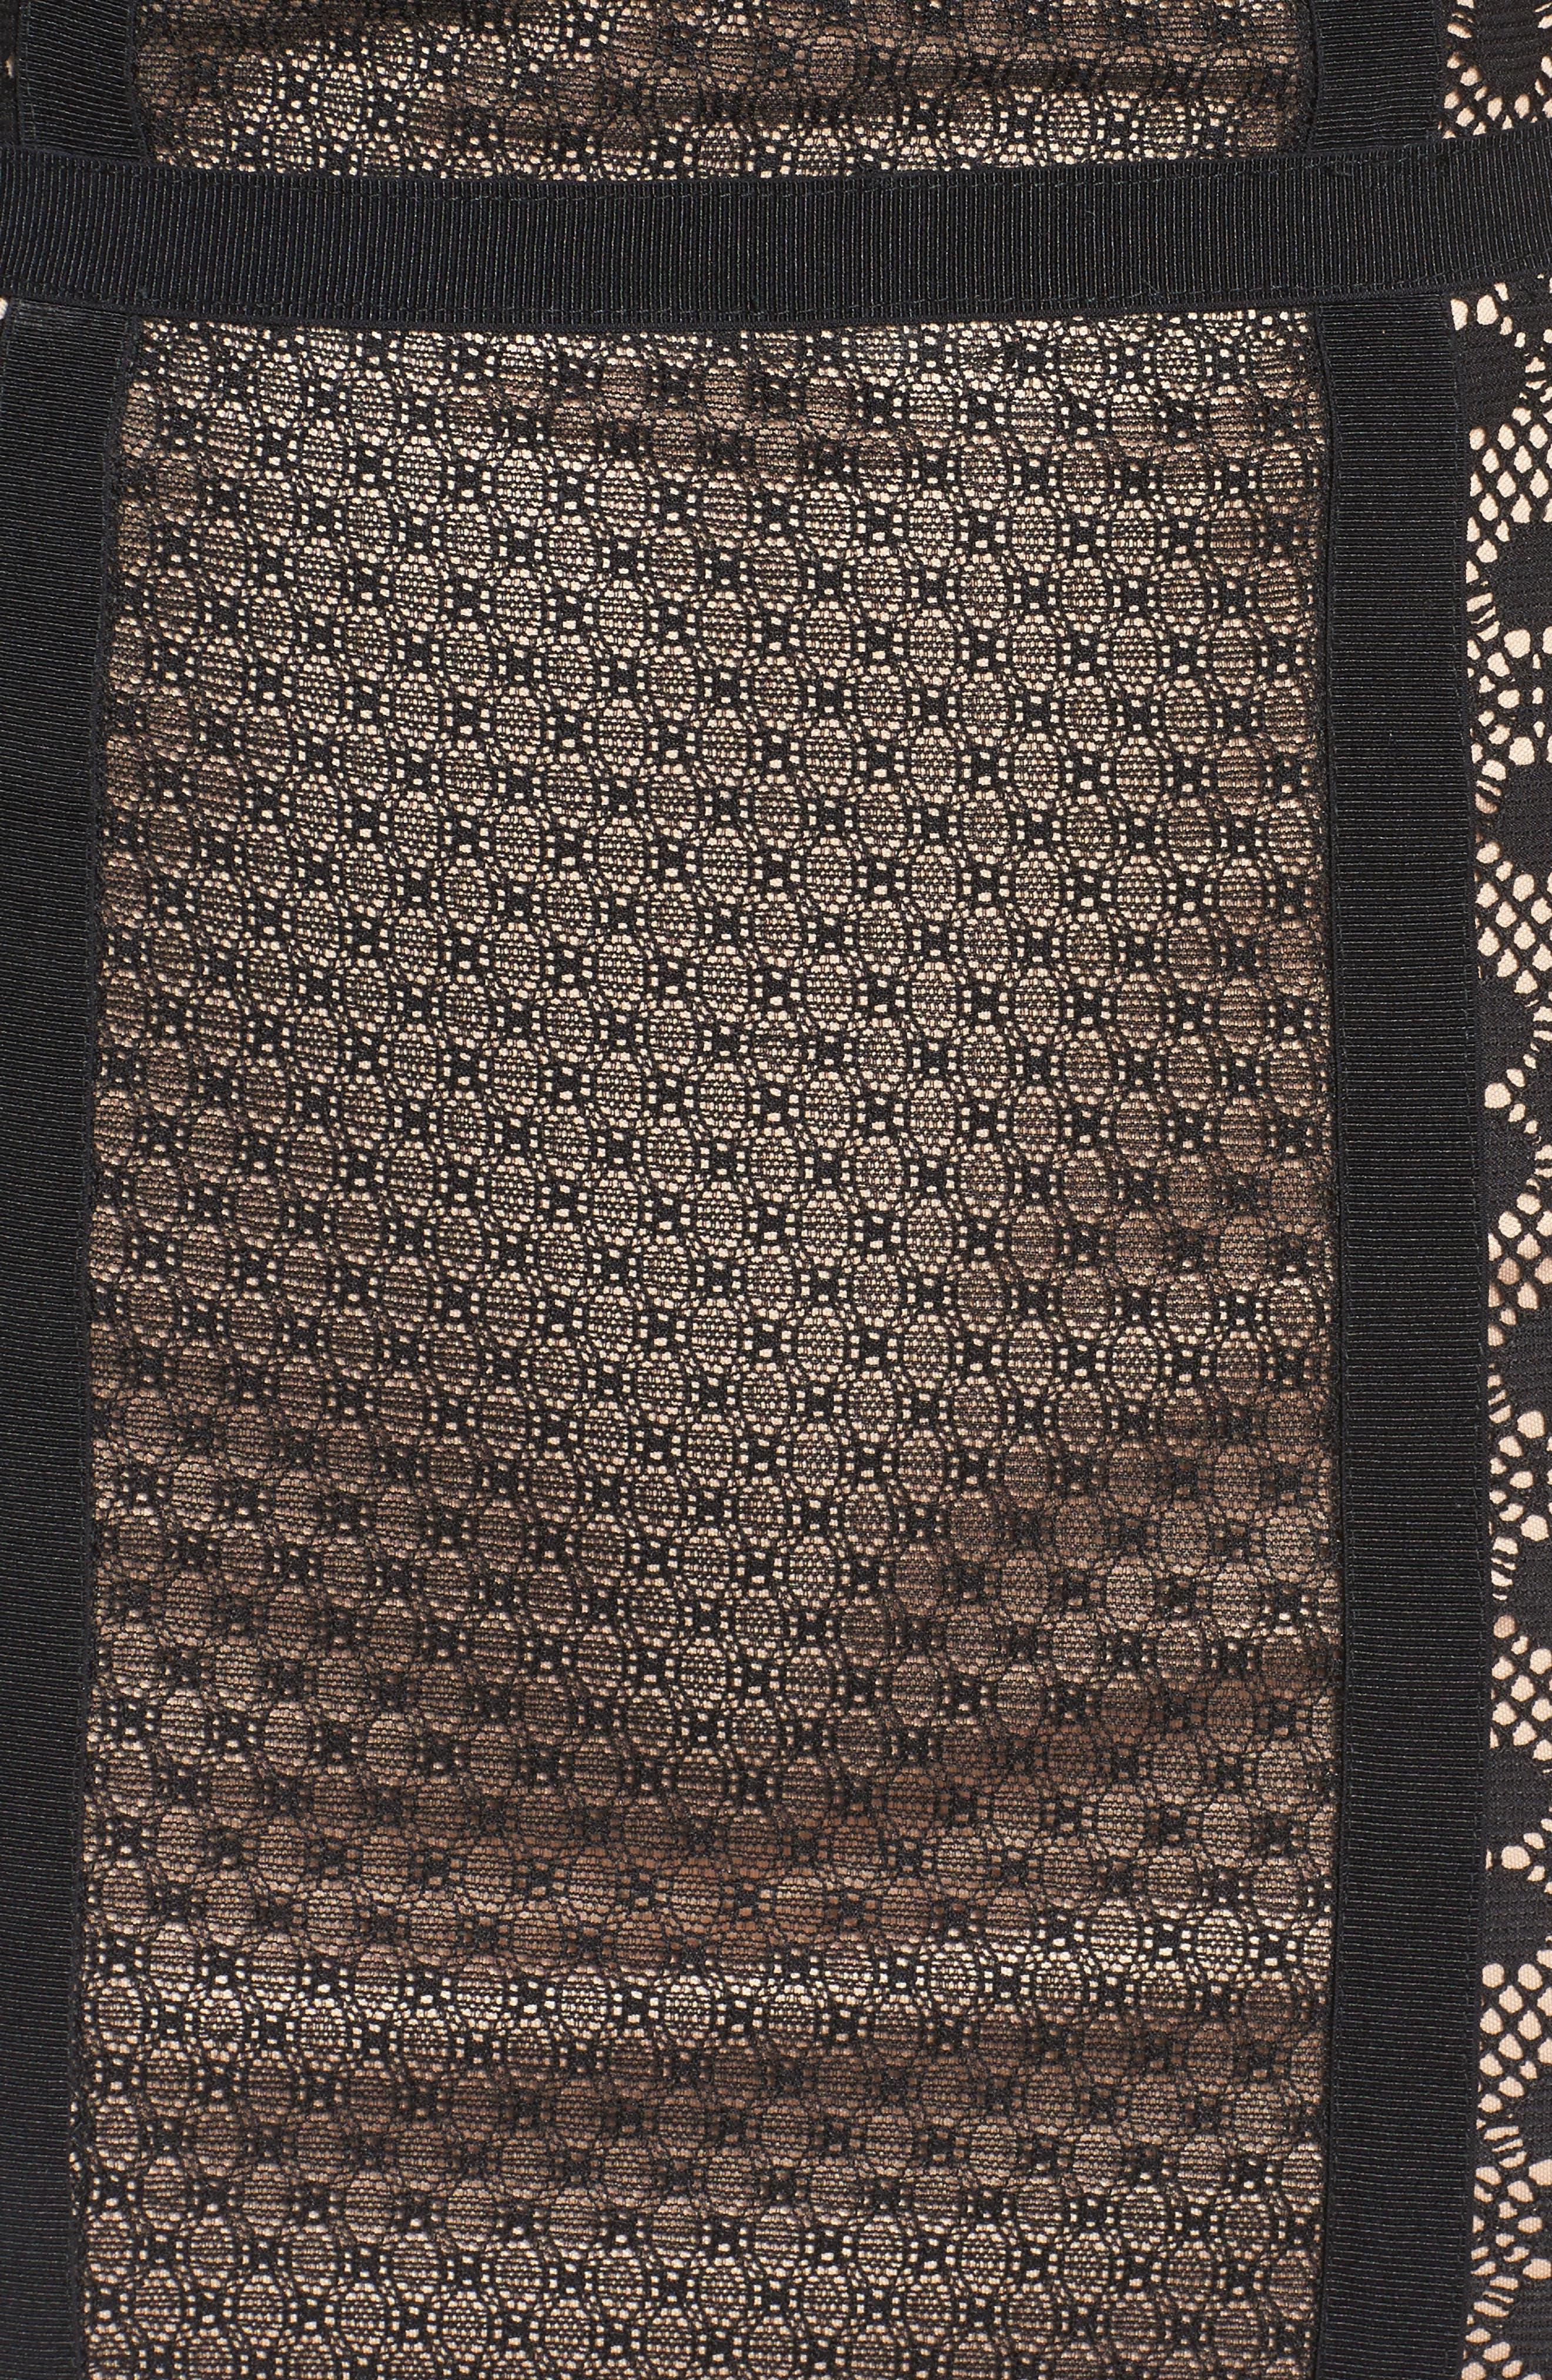 Hola Mamacita Body-Con Dress,                             Alternate thumbnail 6, color,                             Black